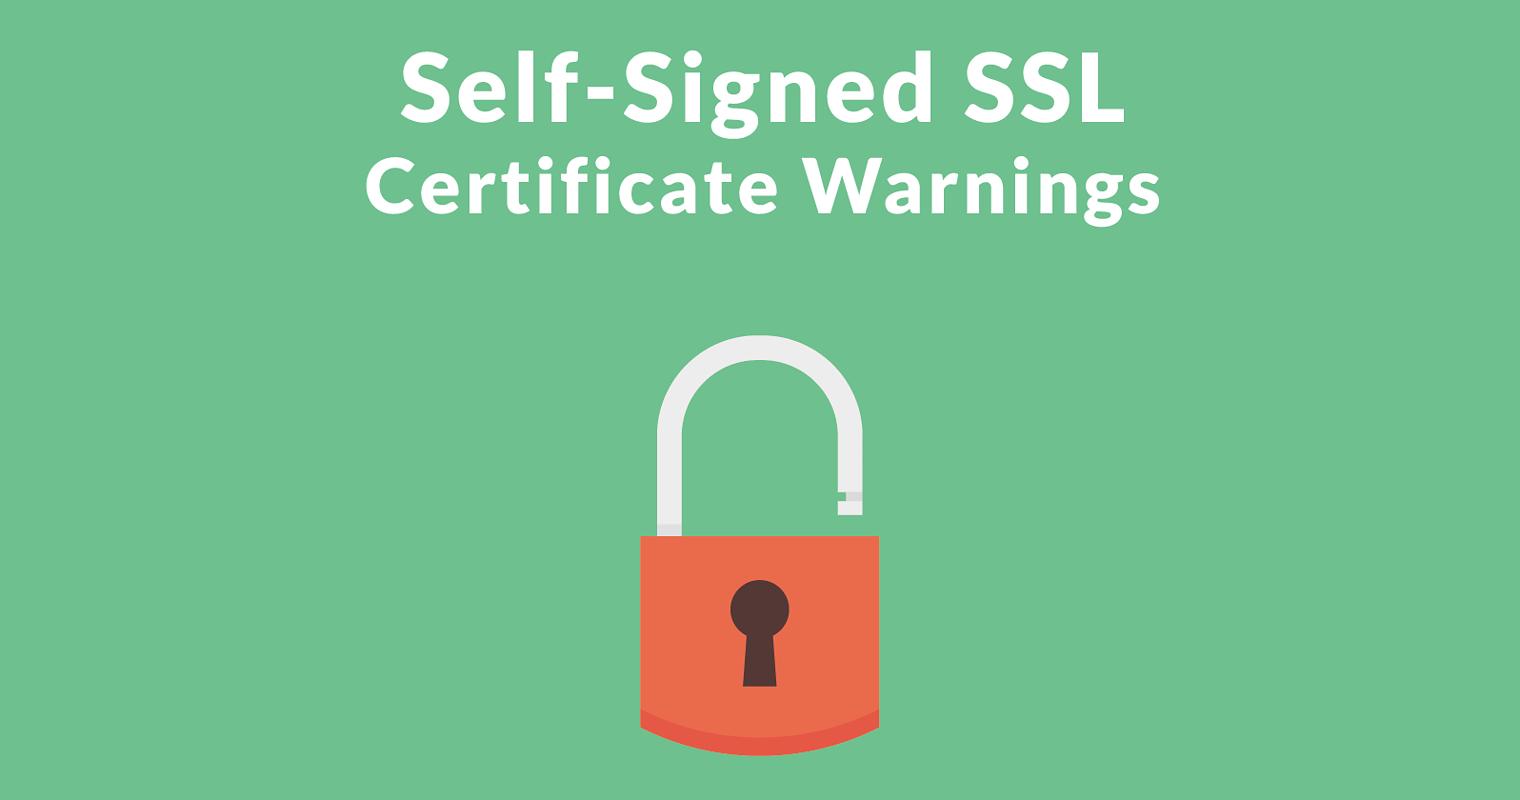 Risks in Using Self-Signed SSL Certificates